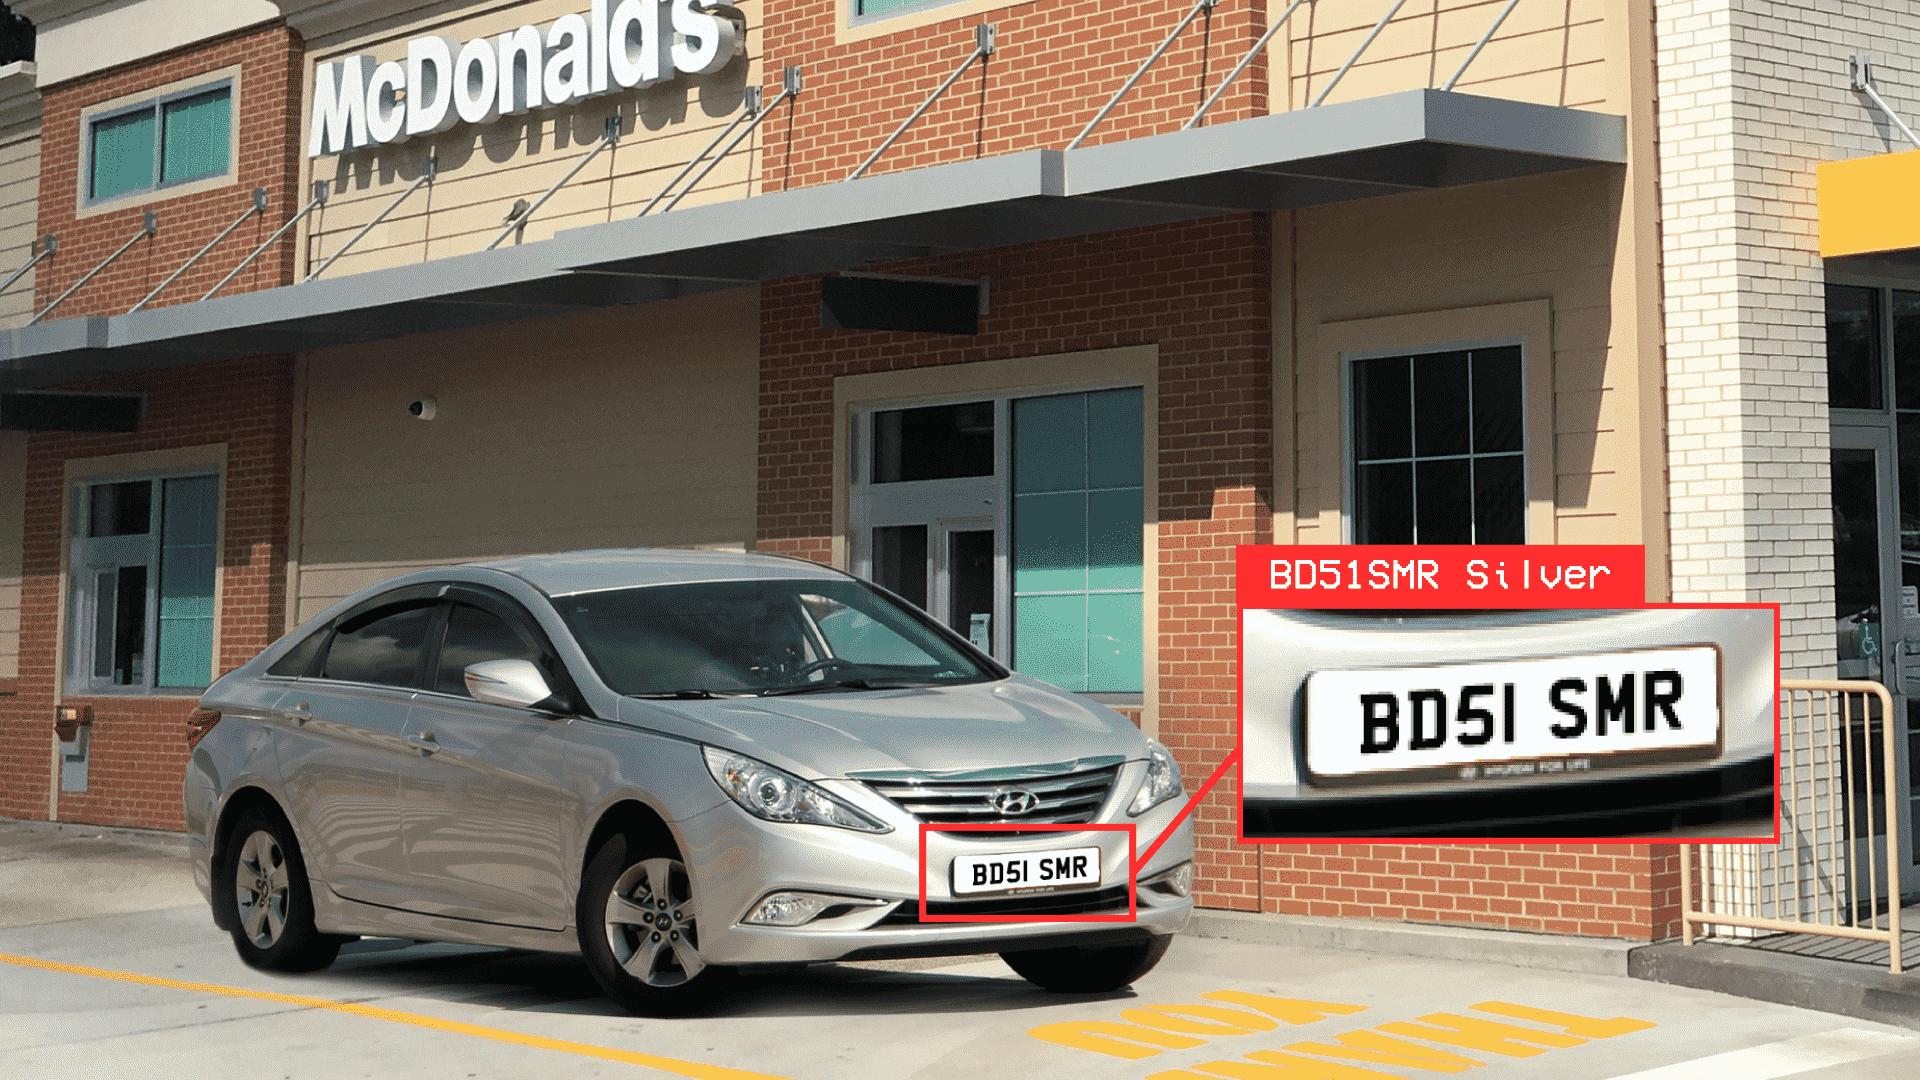 Car Plate Recognition